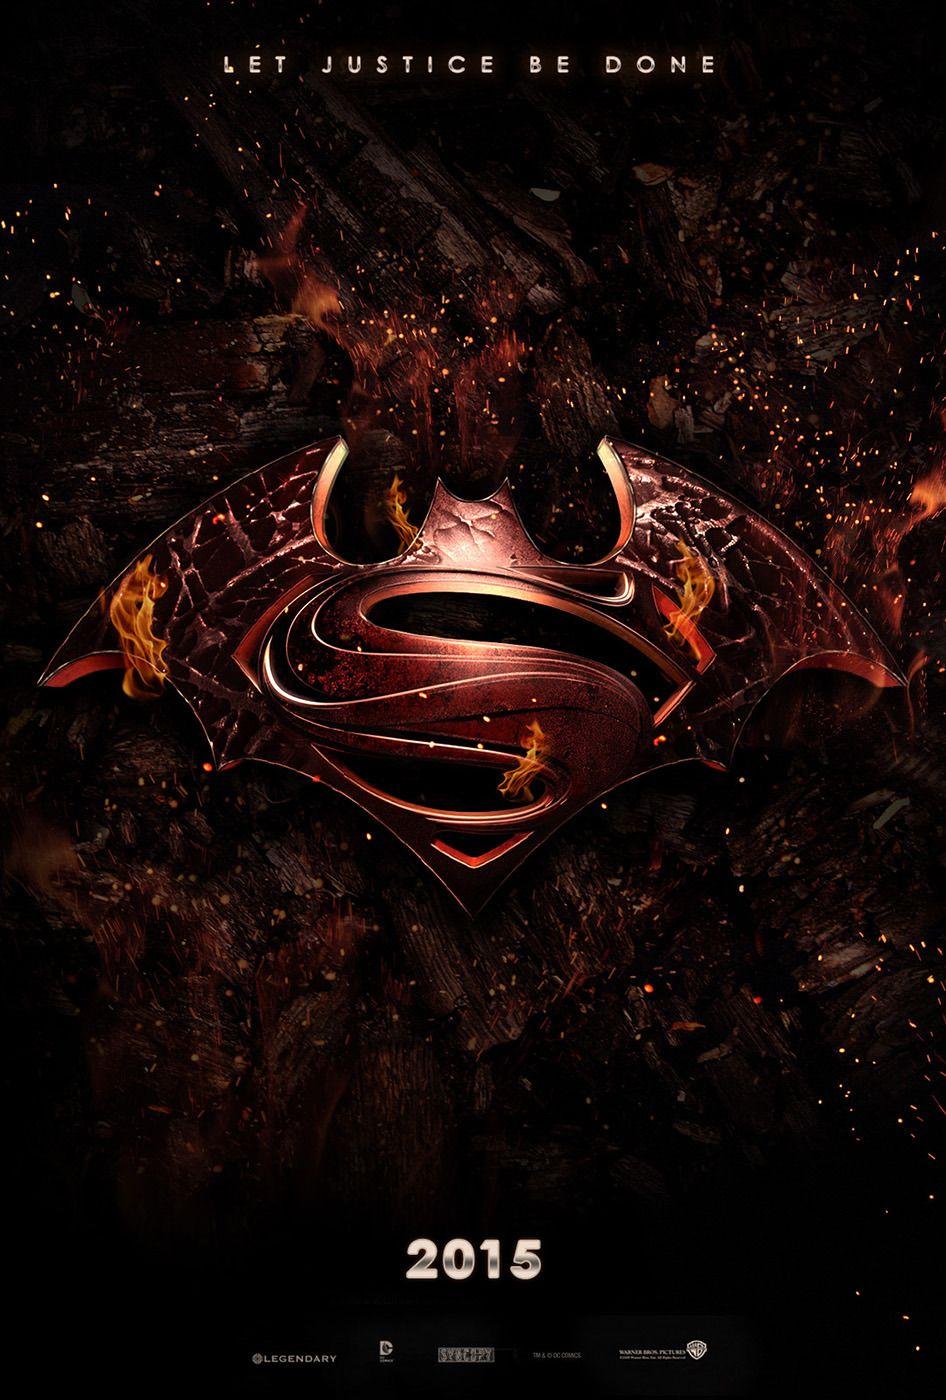 Batman Superman Teaser Poster By Josh I Cant Wait My Inner Nerd Is Going Bananas